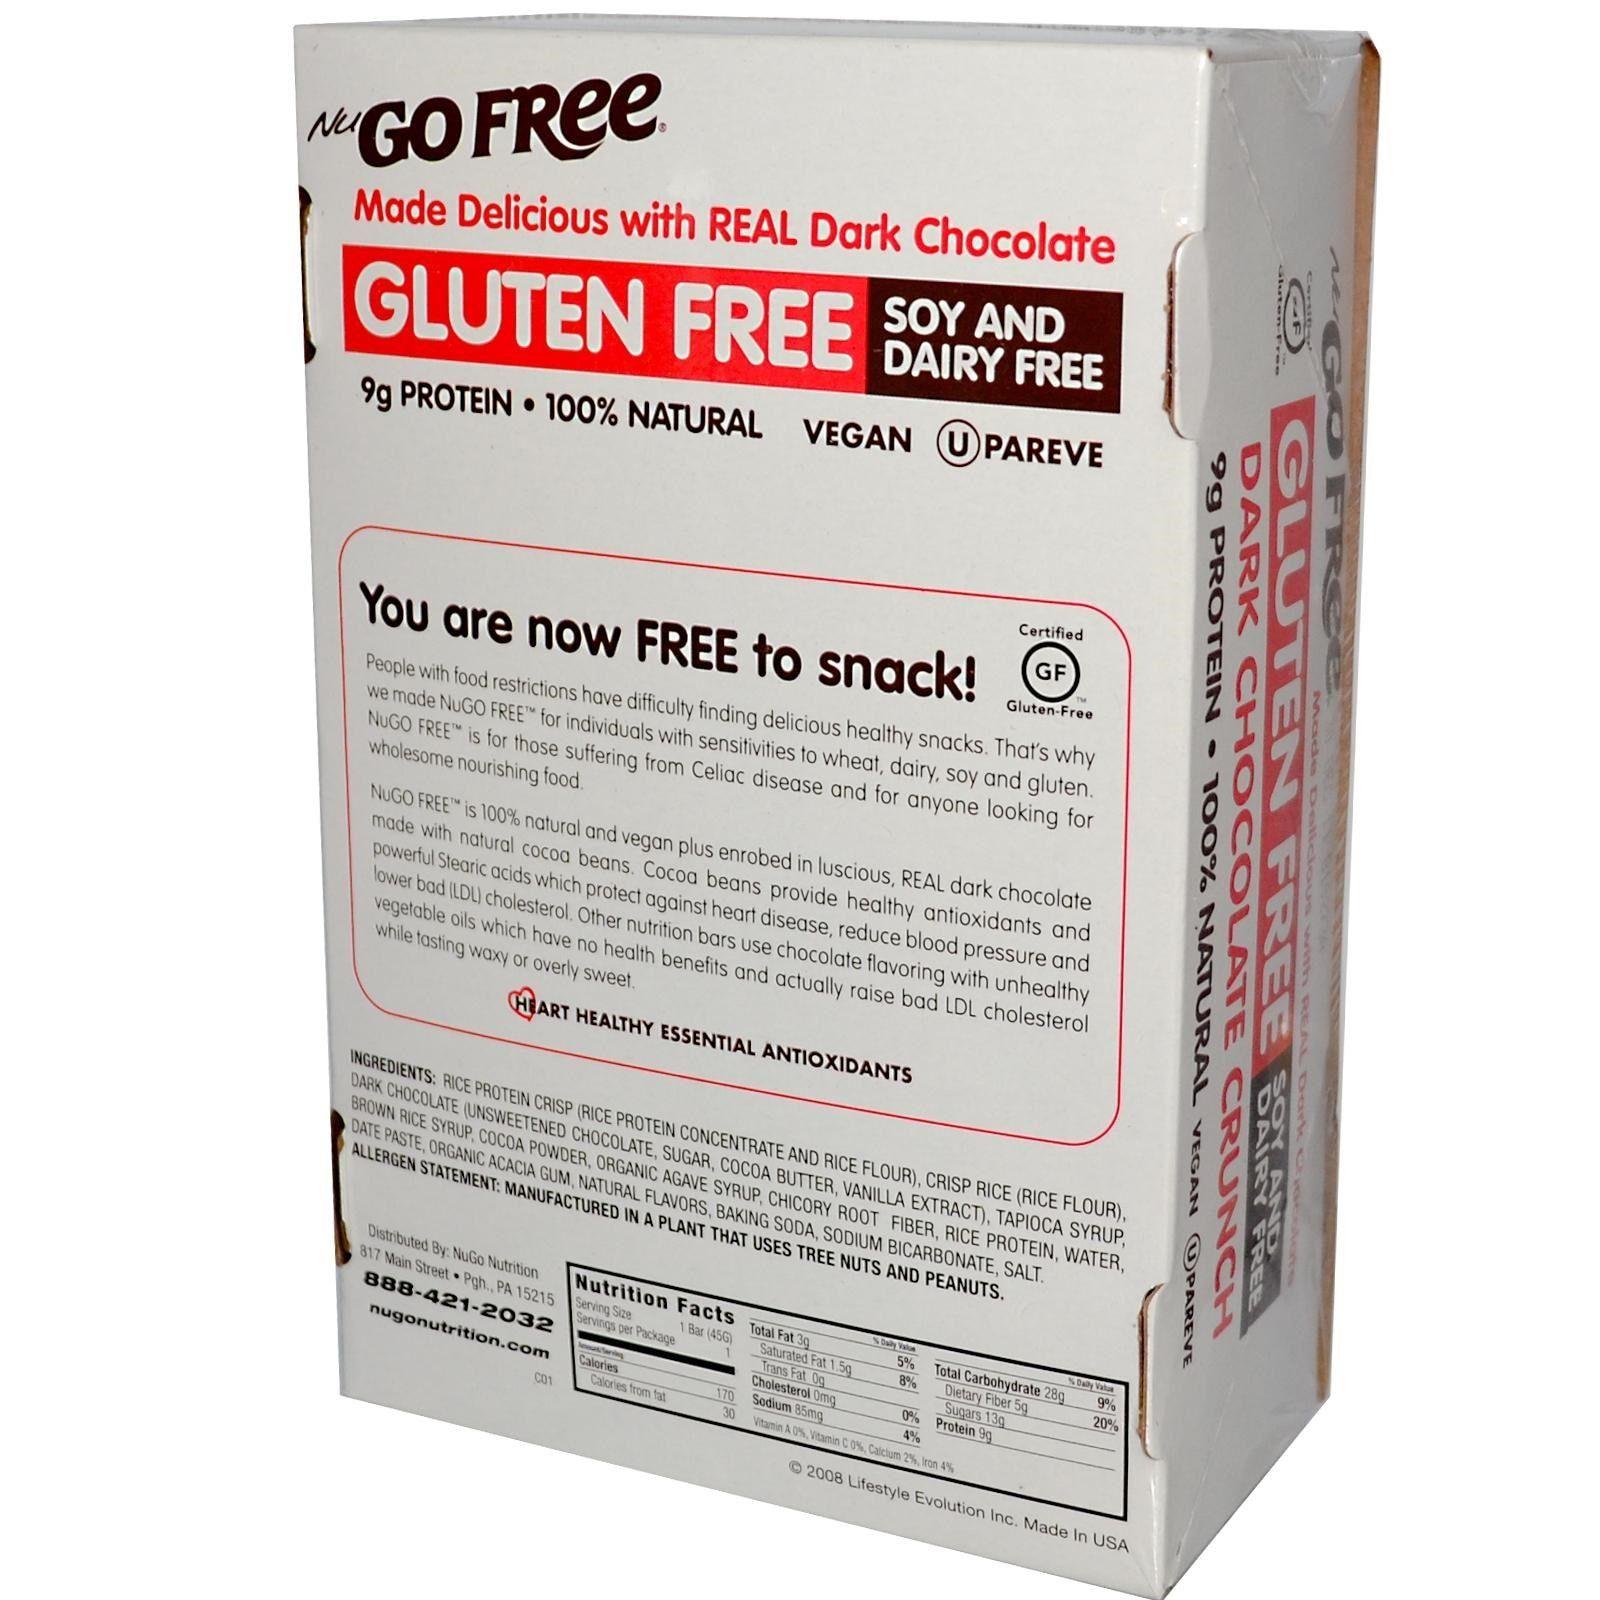 NuGo Nutrition, Free, Gluten Free, Dark Chocolate Crunch, 12 Bars, 1.59 oz (45 g) Each